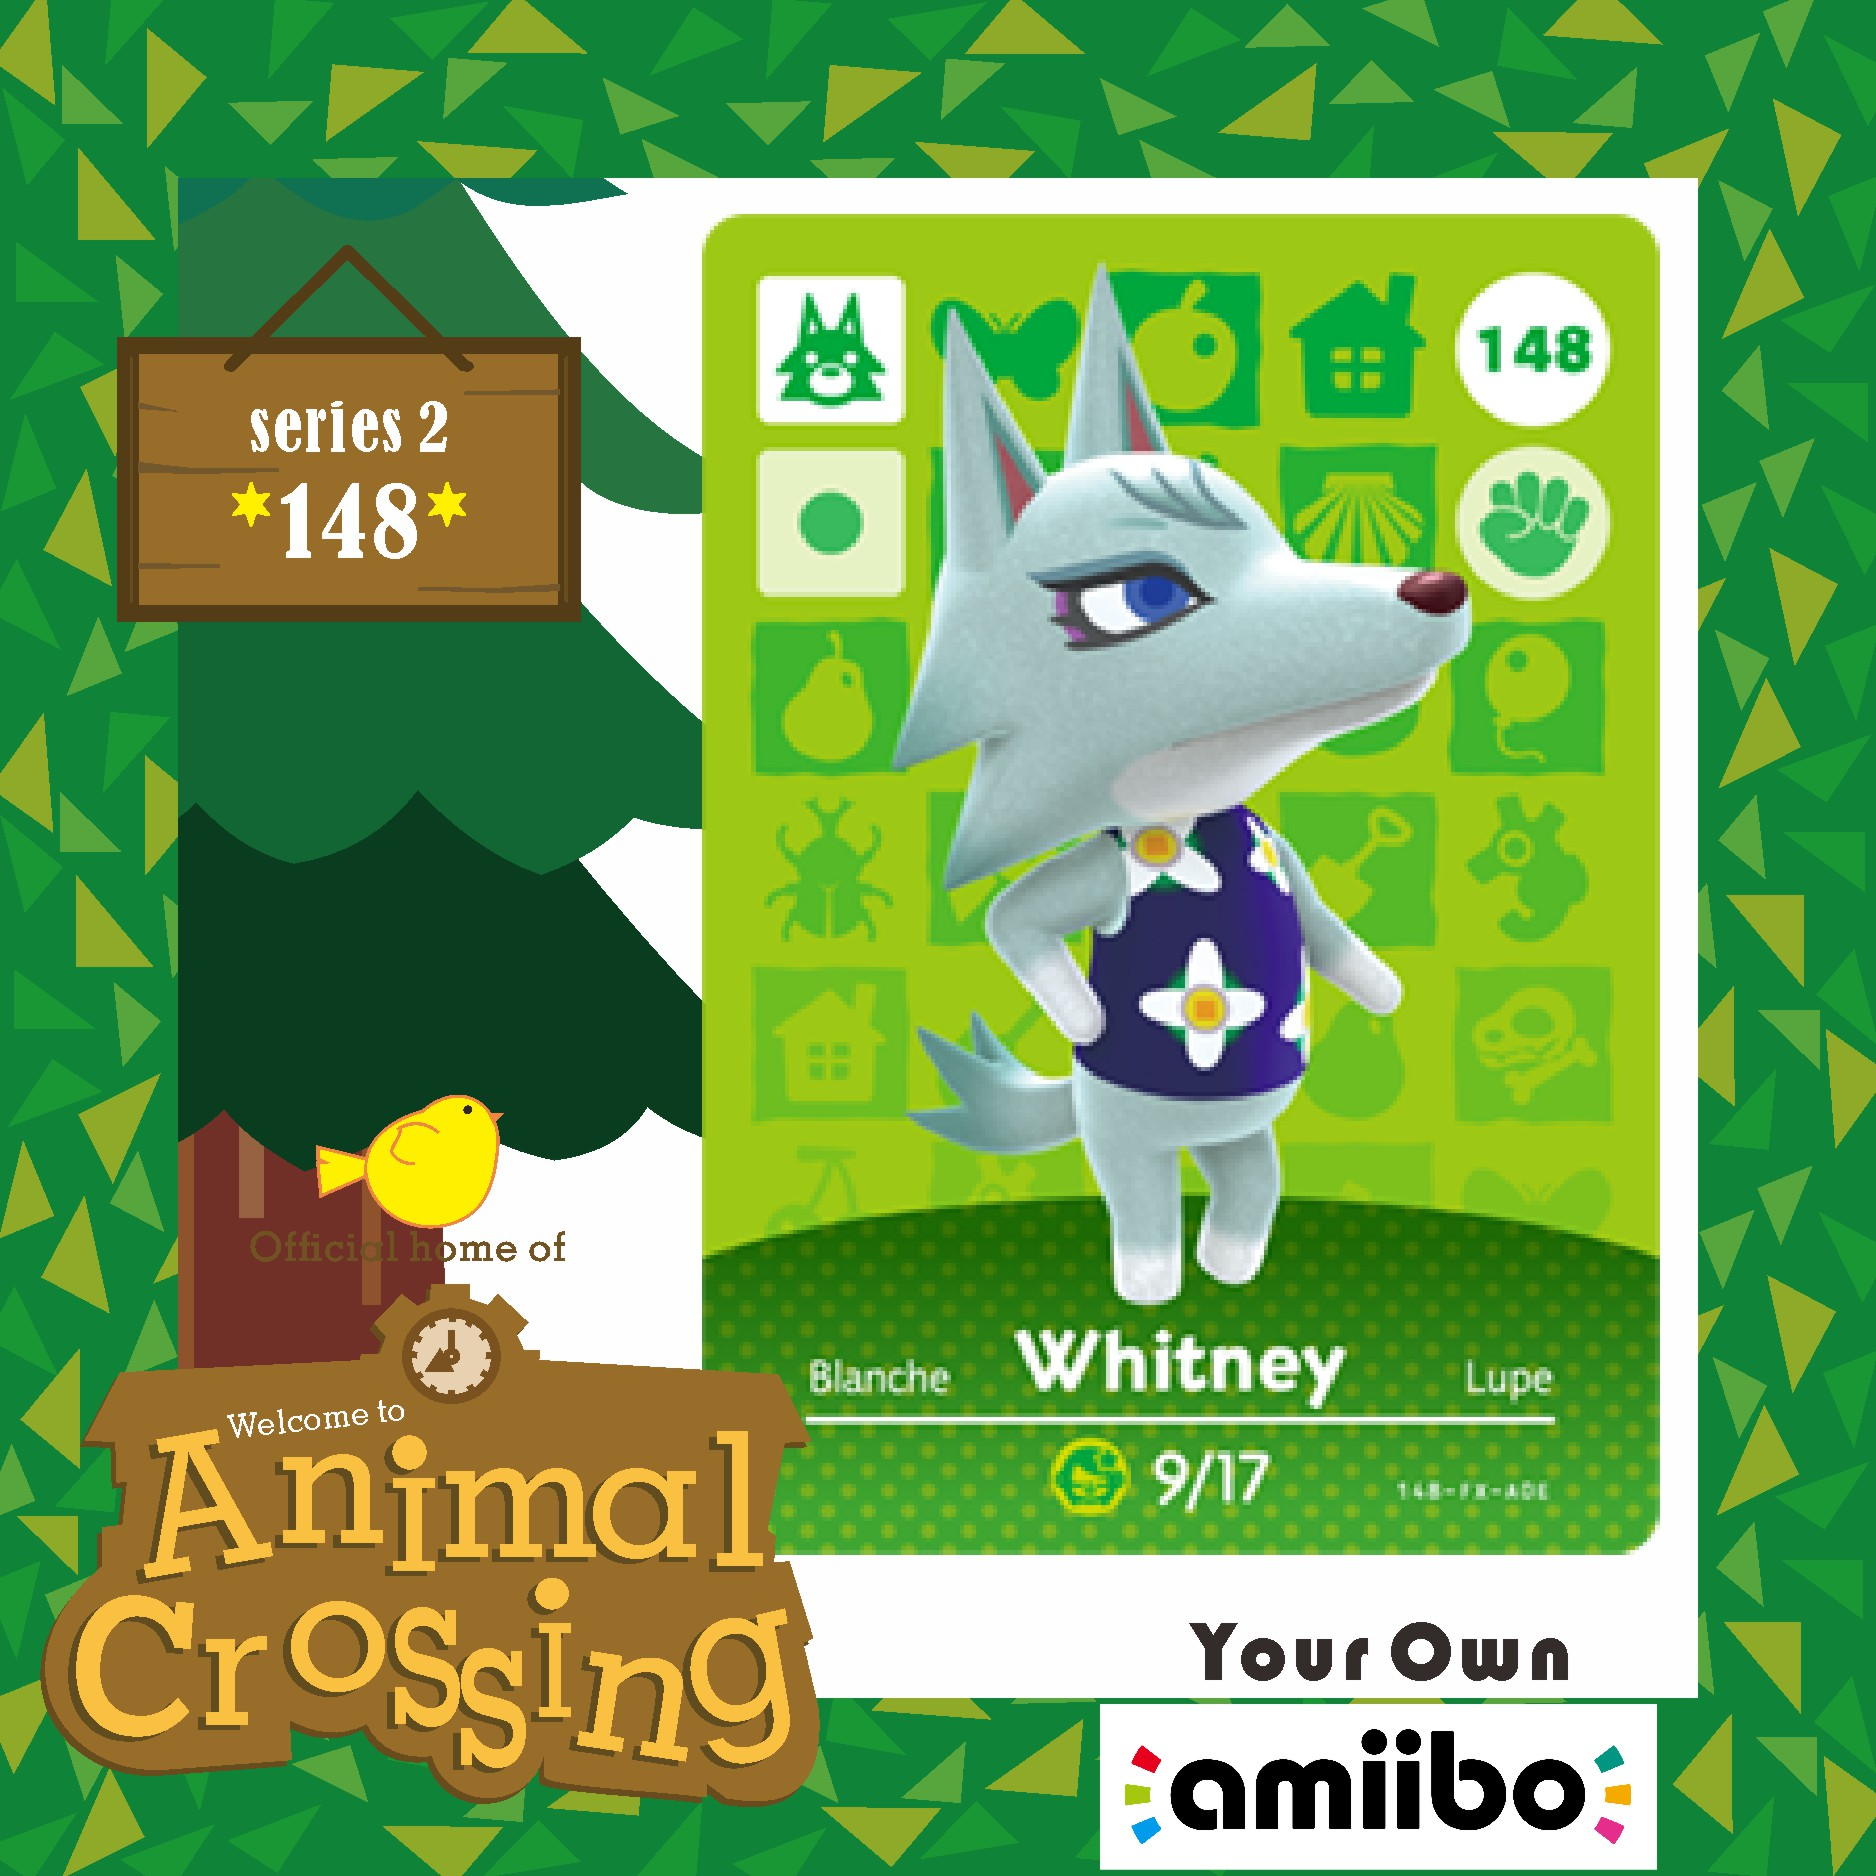 Amiibo Animal Crossing Amiibo Card 148 Amiibo Animal Crossing Amiibo Card Whitney Villager Whitney 148 Series Season Set  2